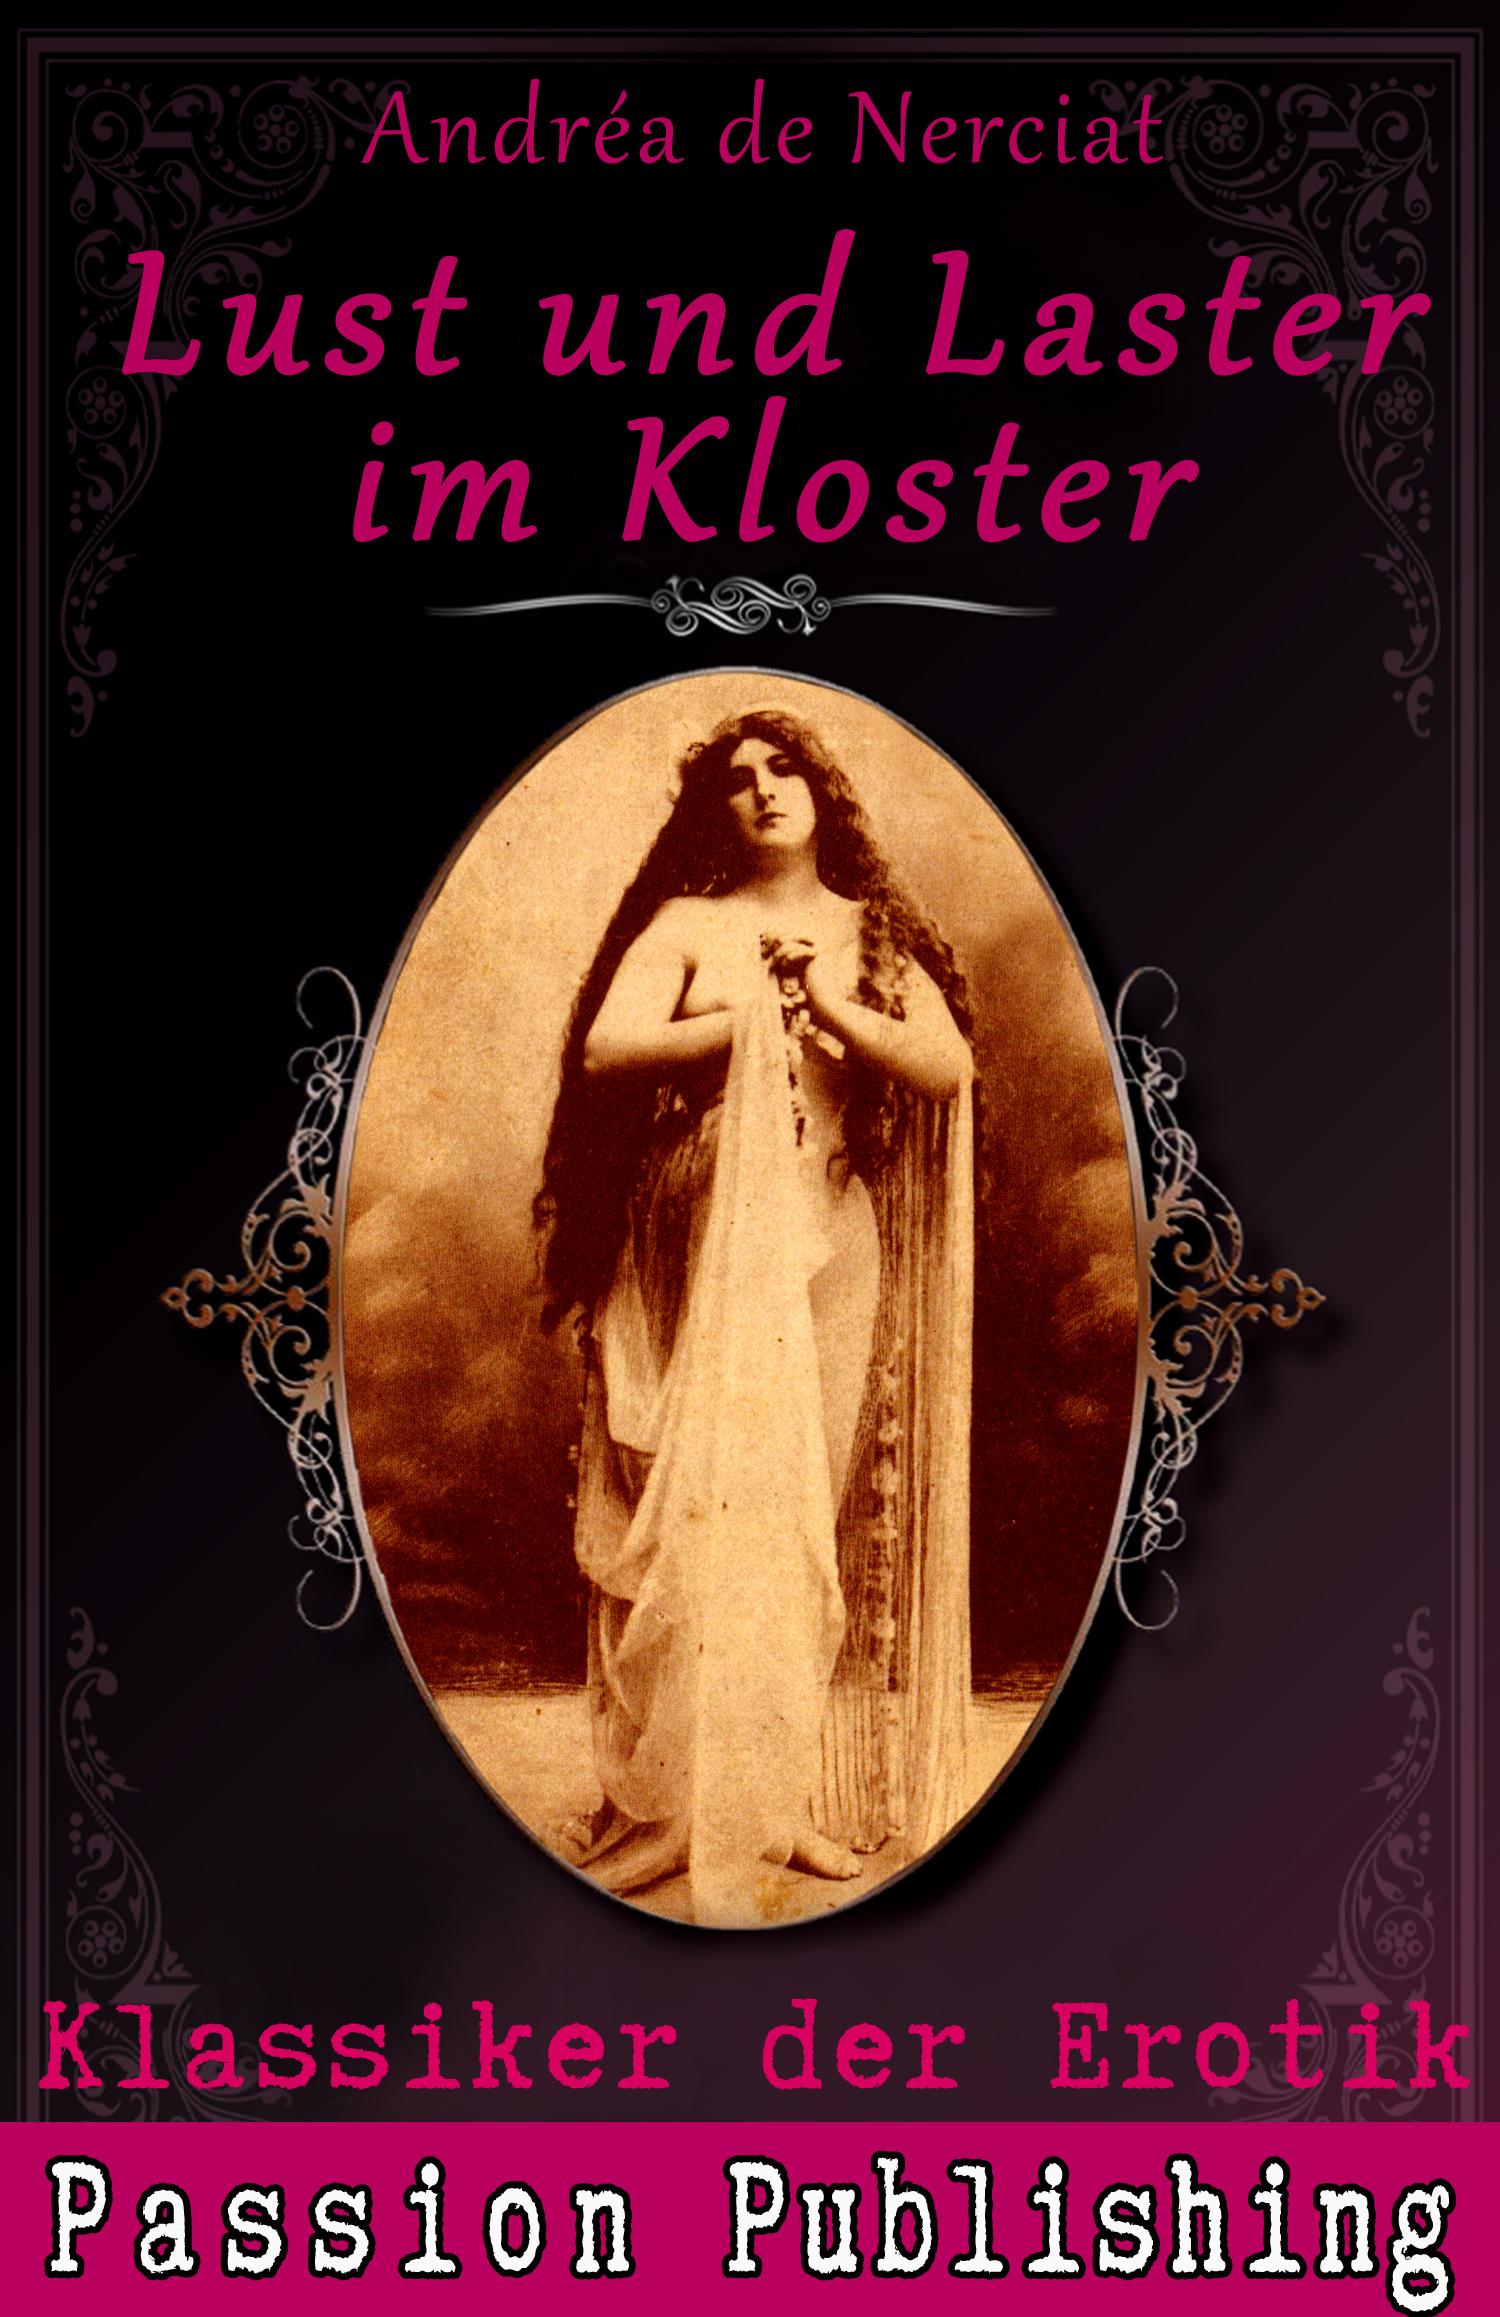 Andrea de Nerciat Klassiker der Erotik 9: Lust und Laster im Kloster недорого